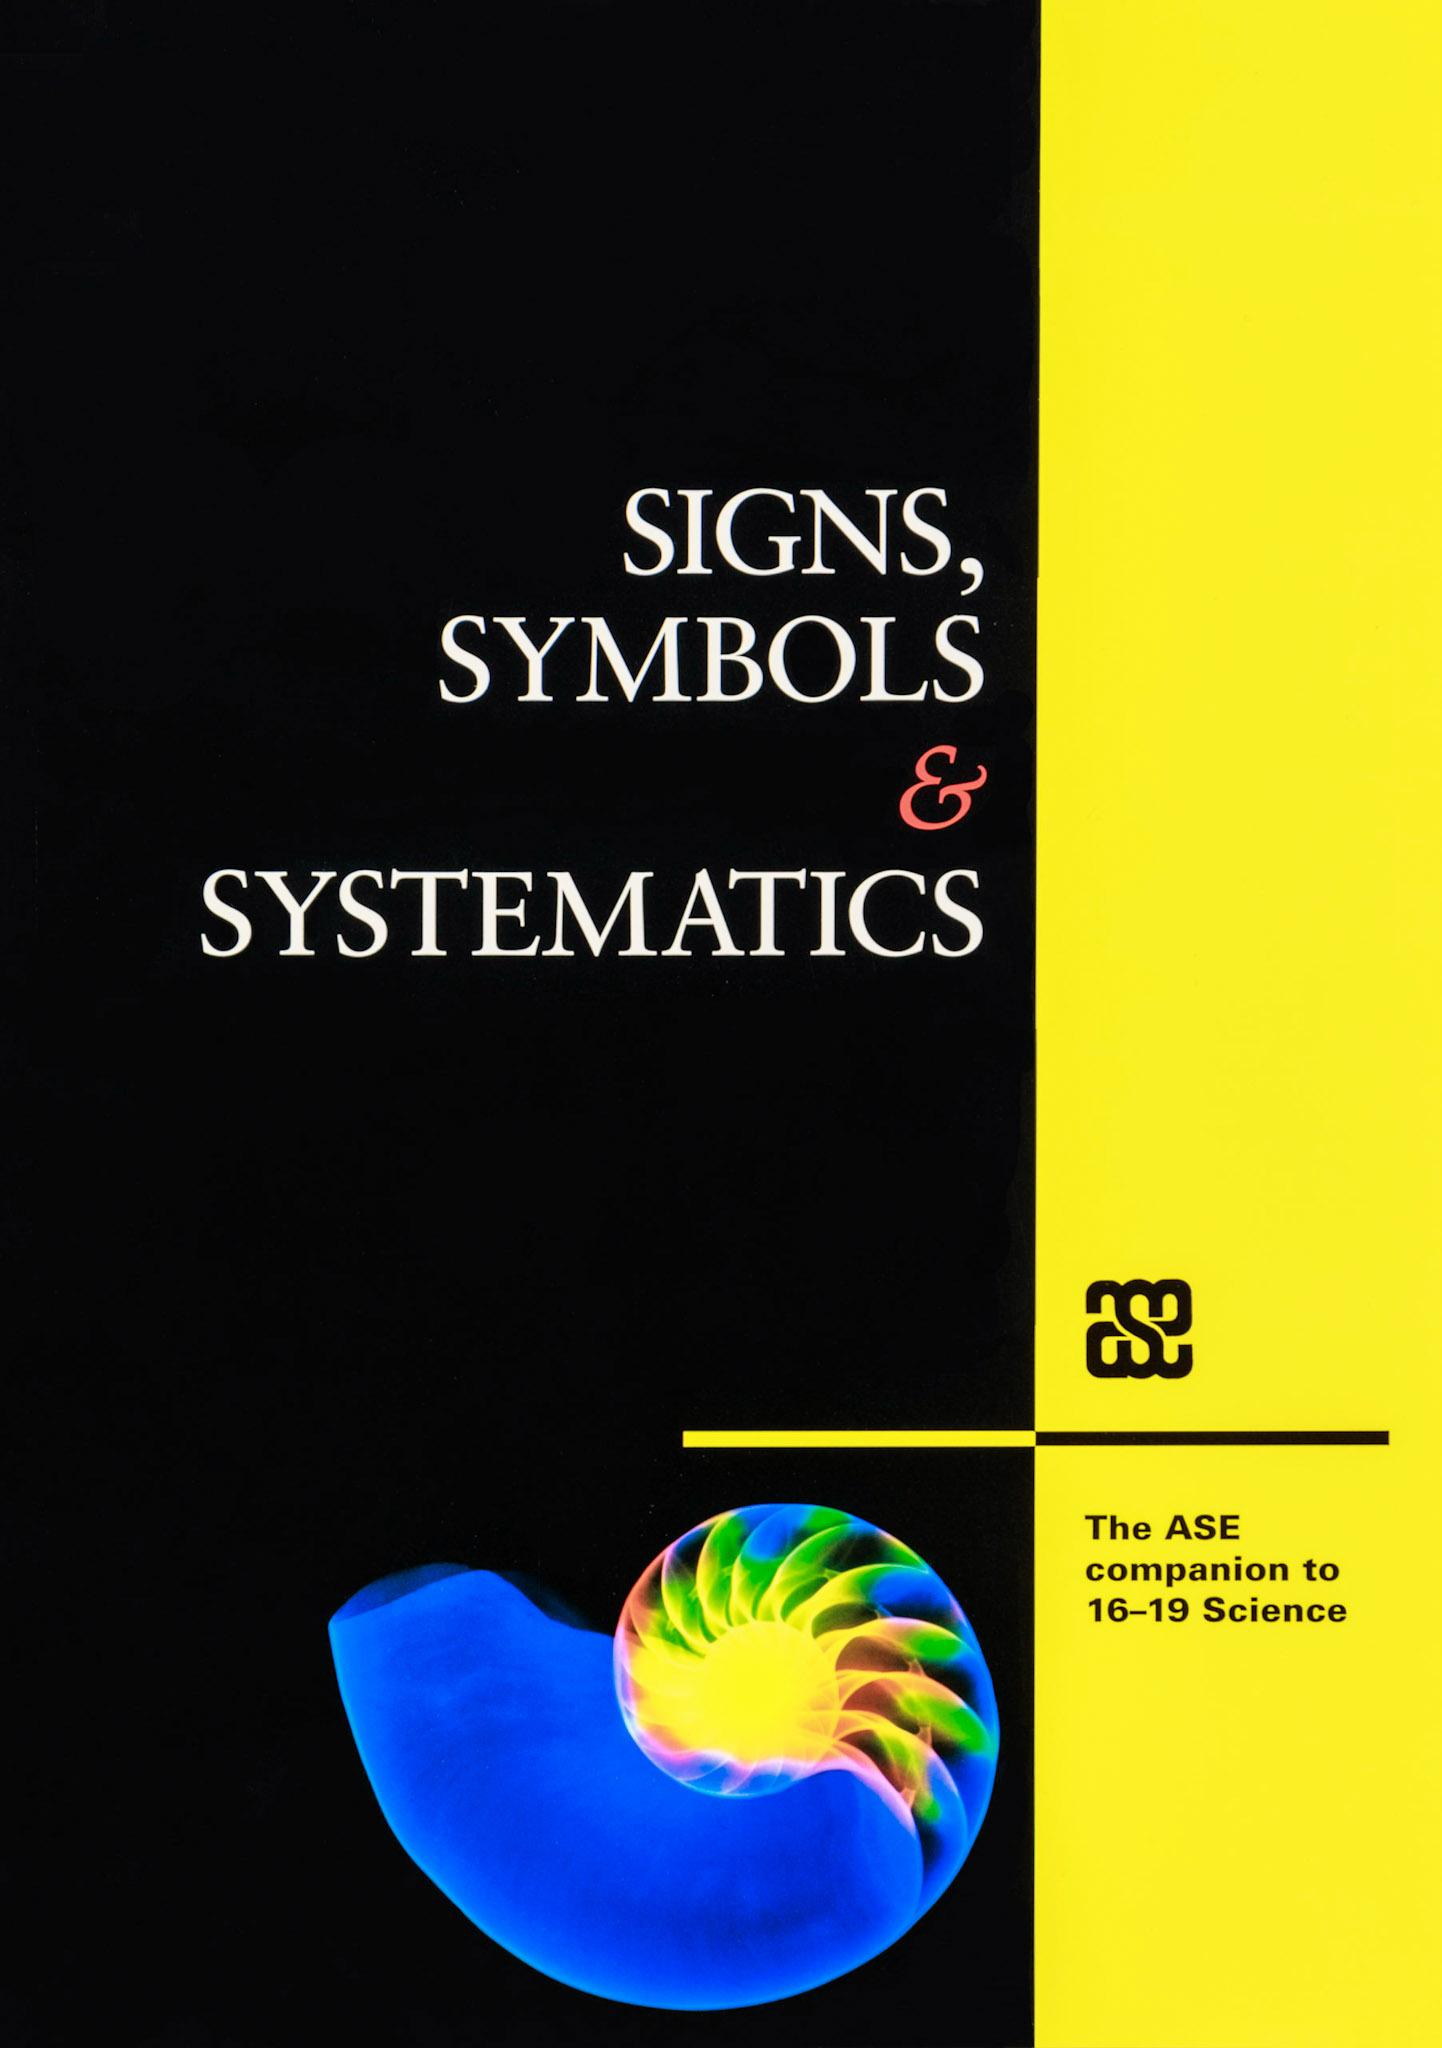 Signs, Symbols & Systematics